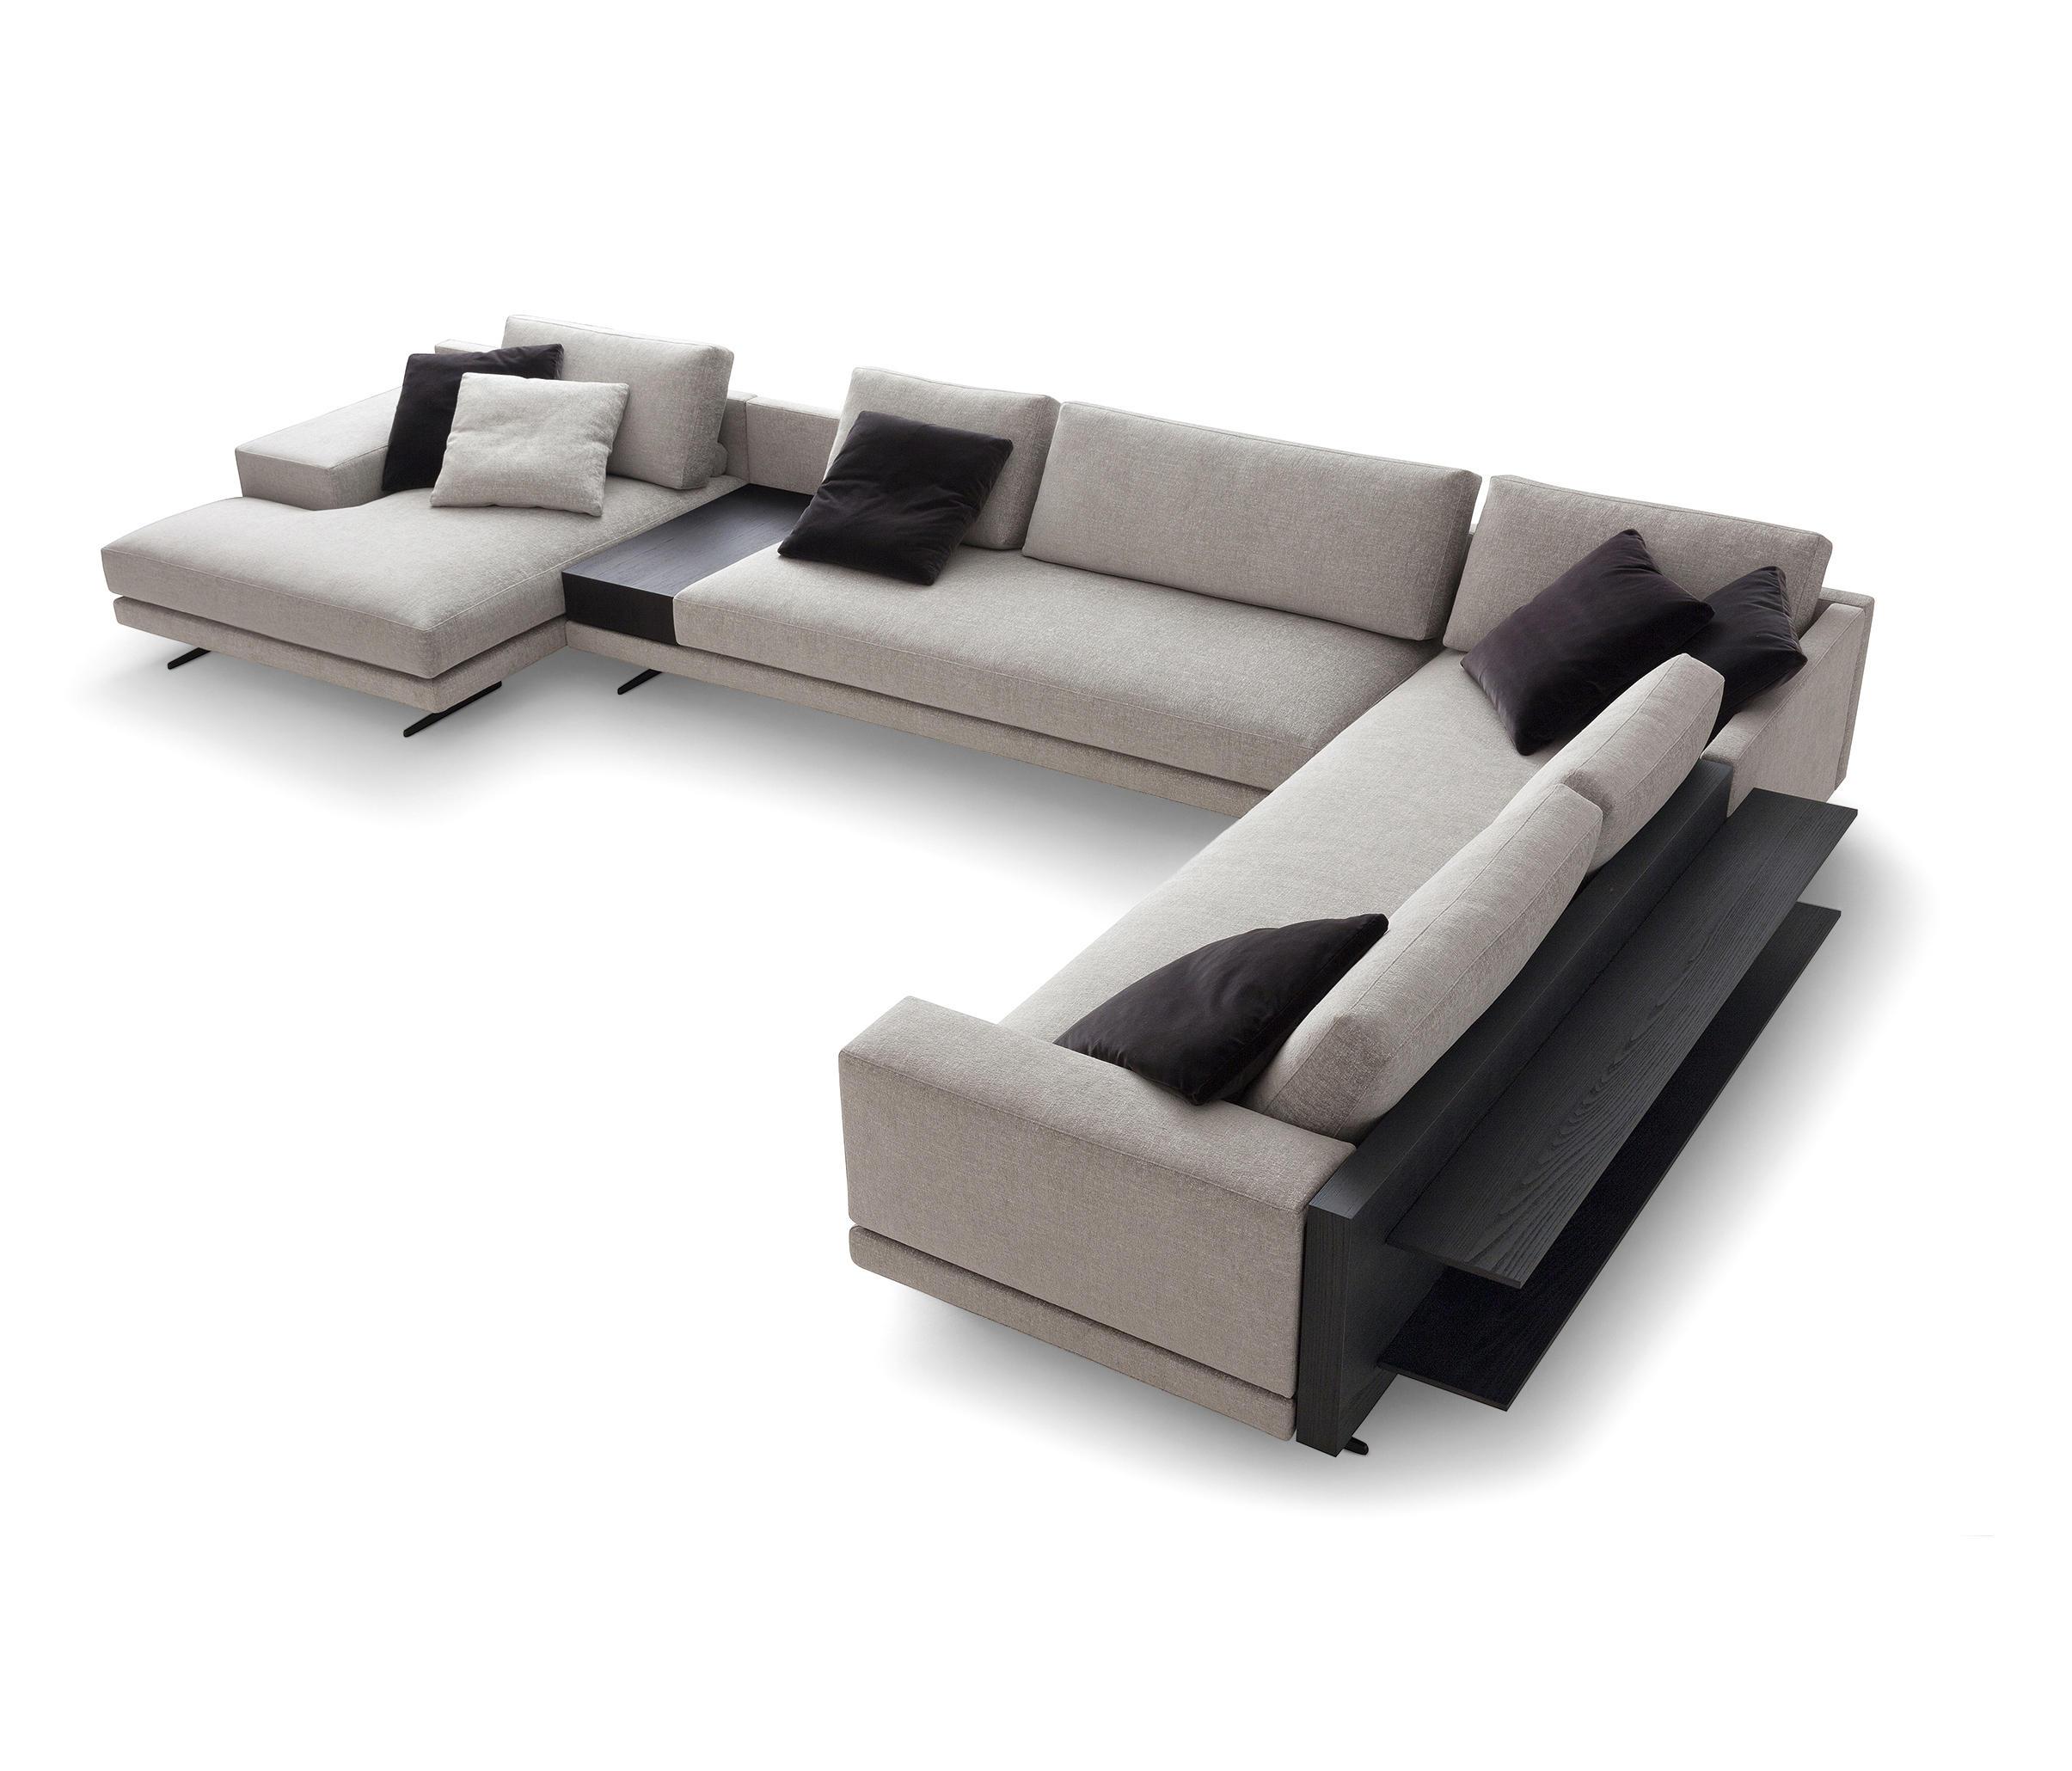 Poliform: MONDRIAN SEATING SYSTEM - Sofas From Poliform